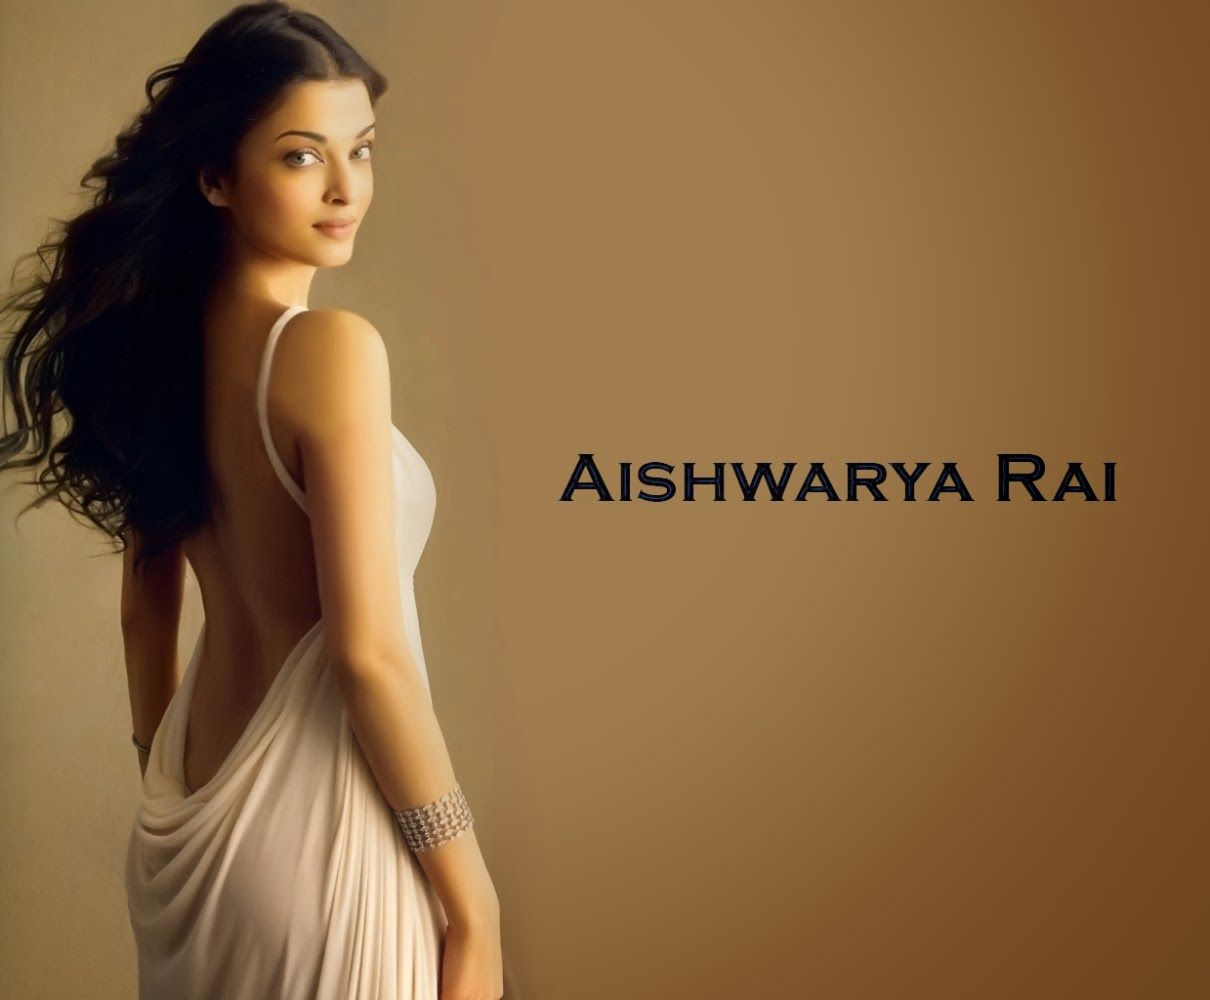 beautiful aishwarya rai wallpapers and pics × images of | hd